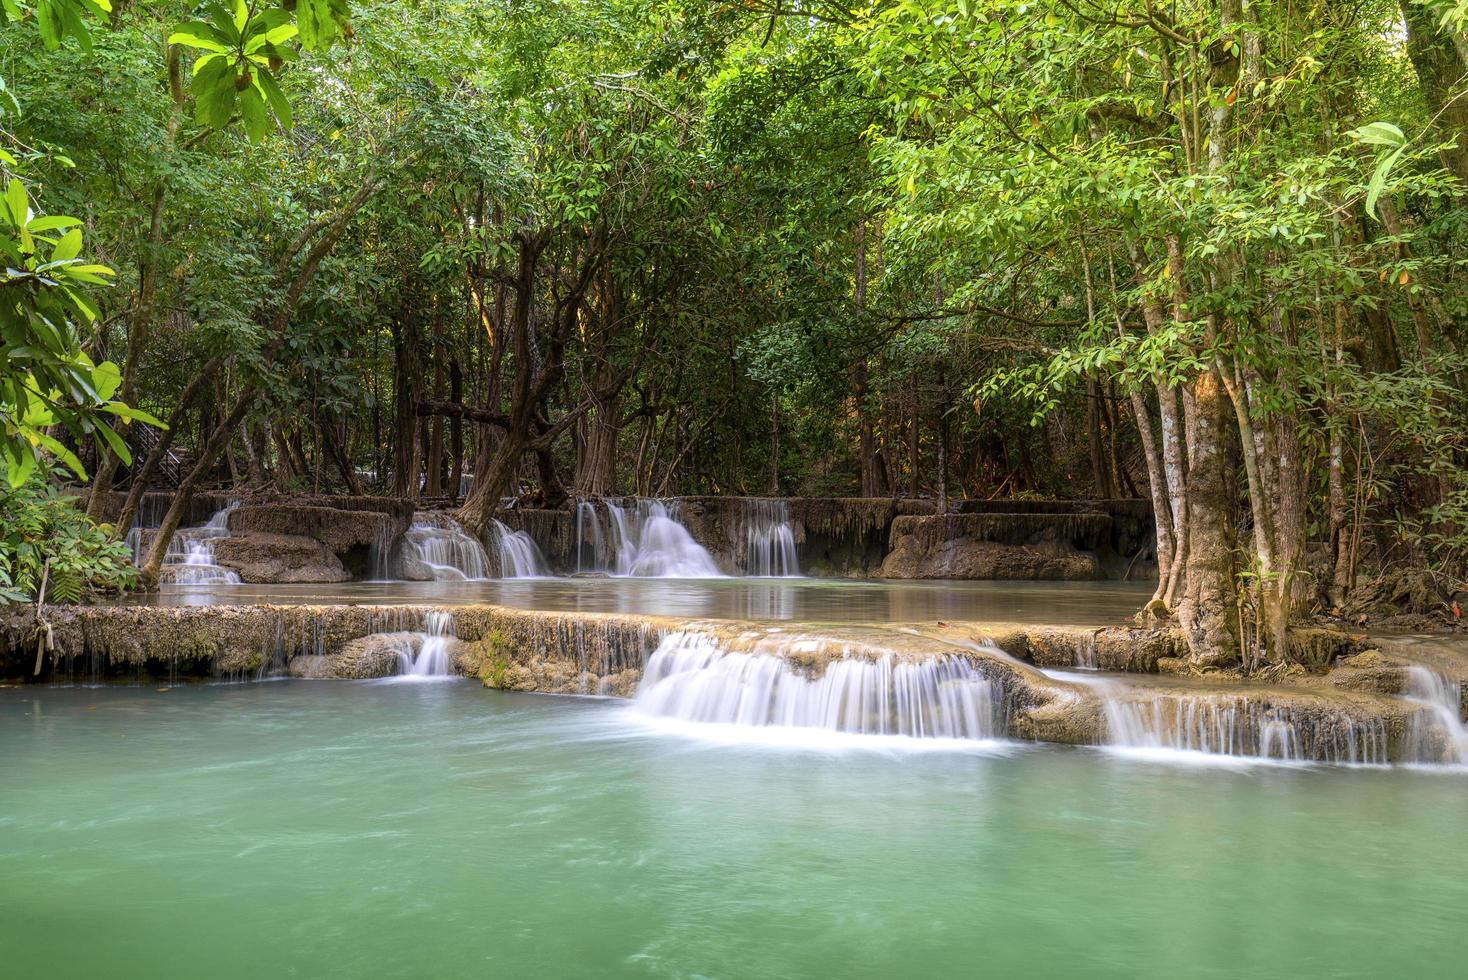 Wasserfall im Khuean Srinagarindra Nationalpark foto